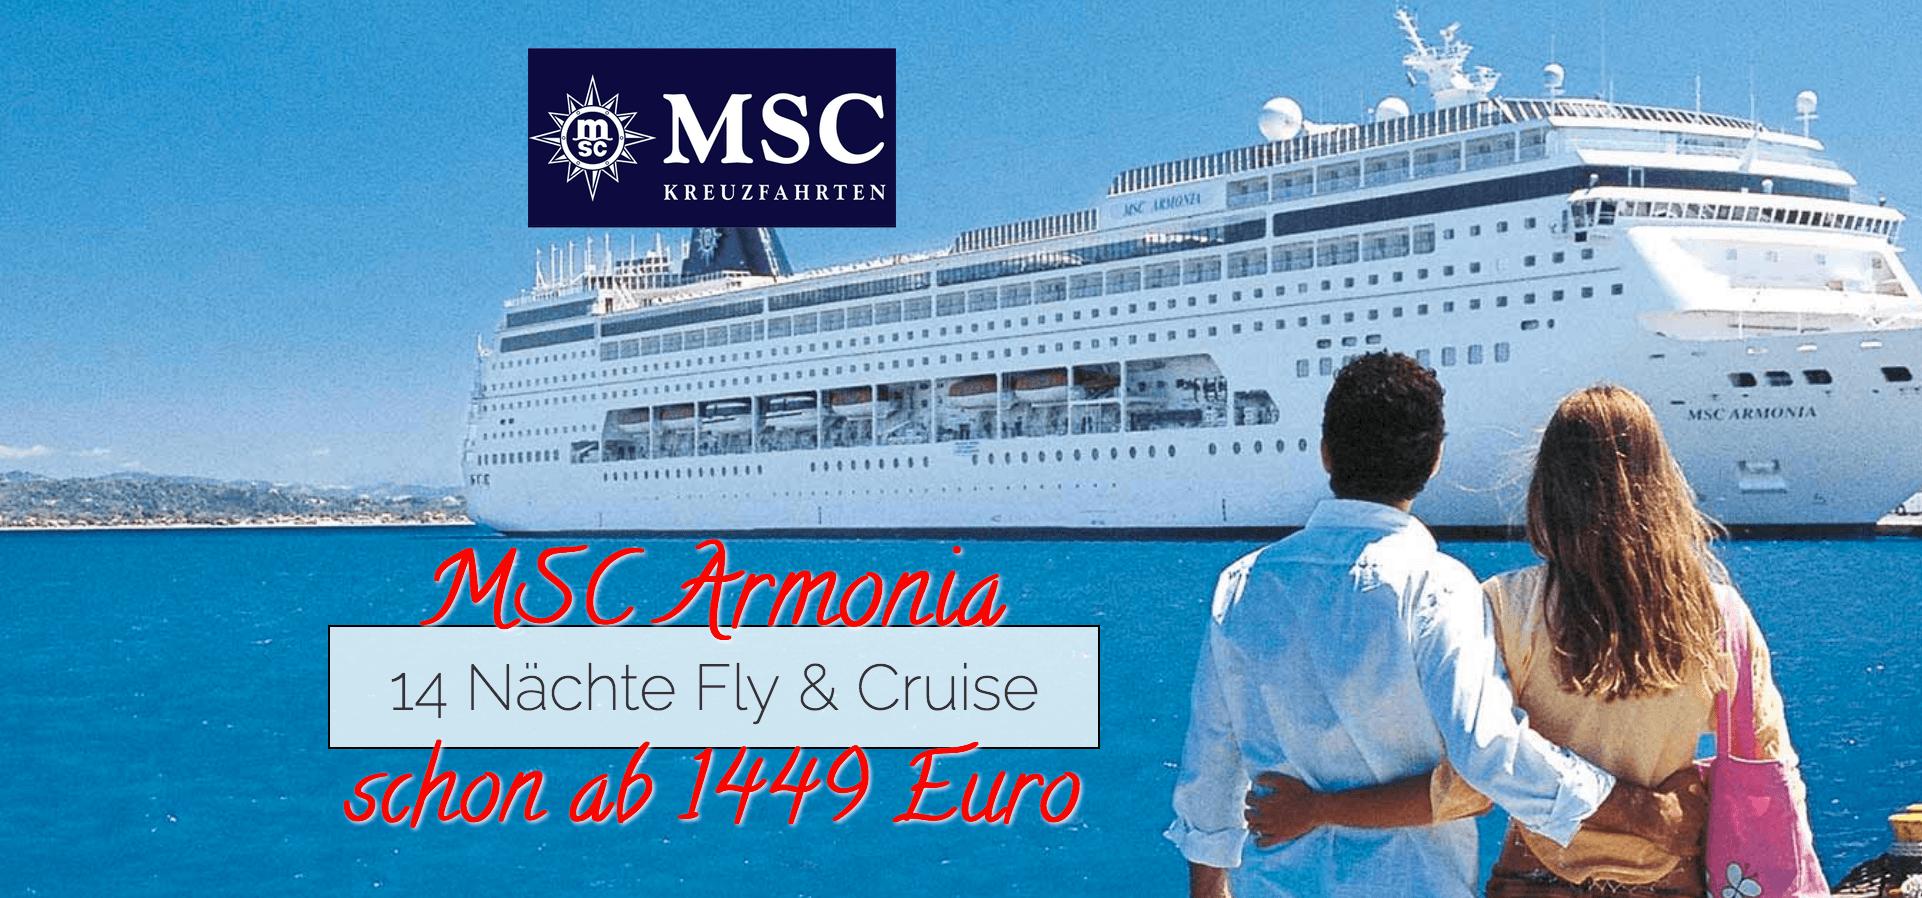 MSC Armonia 14 Nächte Fly & Cruise